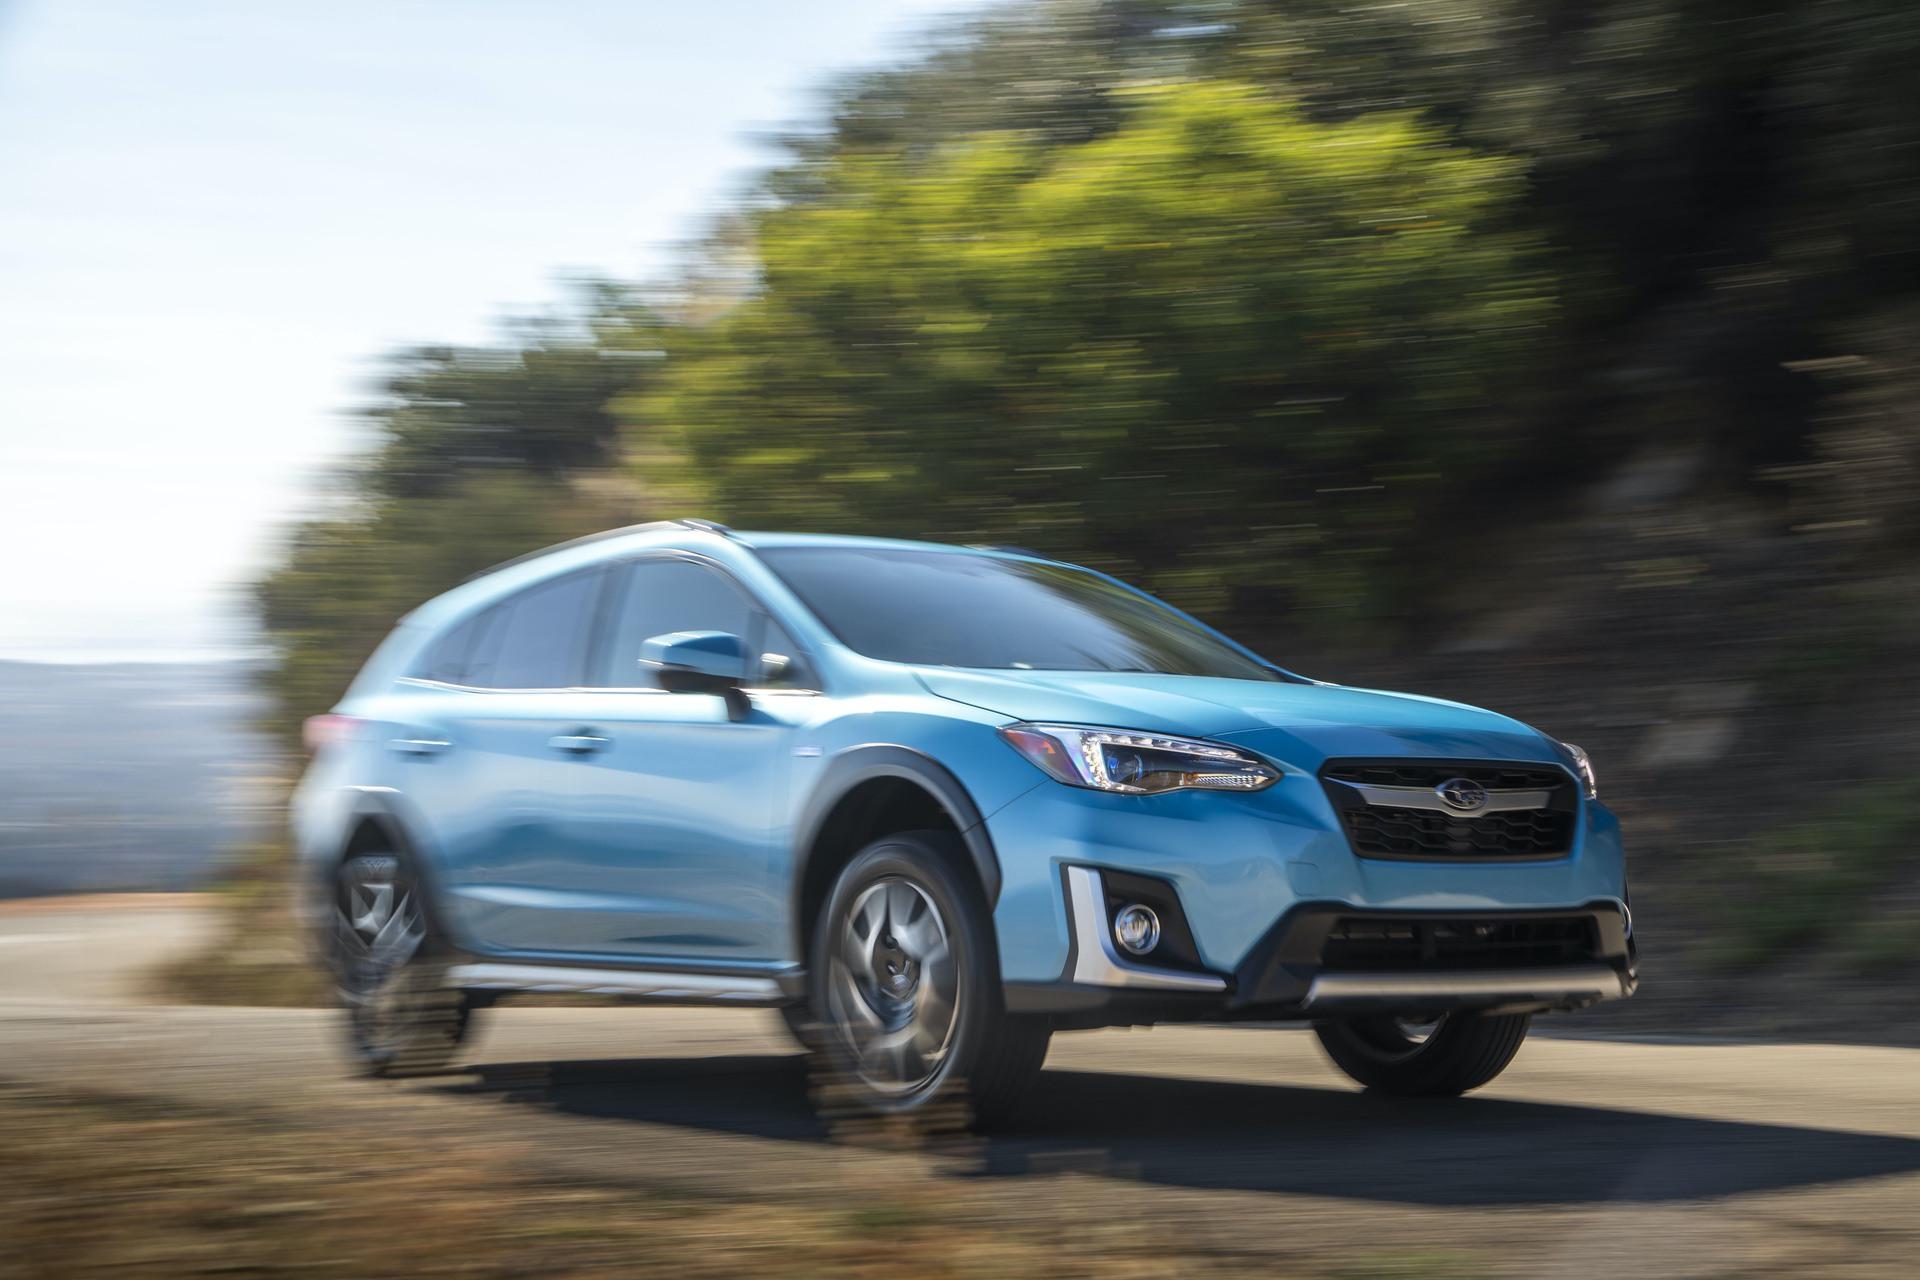 2019_Subaru_XV_Hybrid_0028